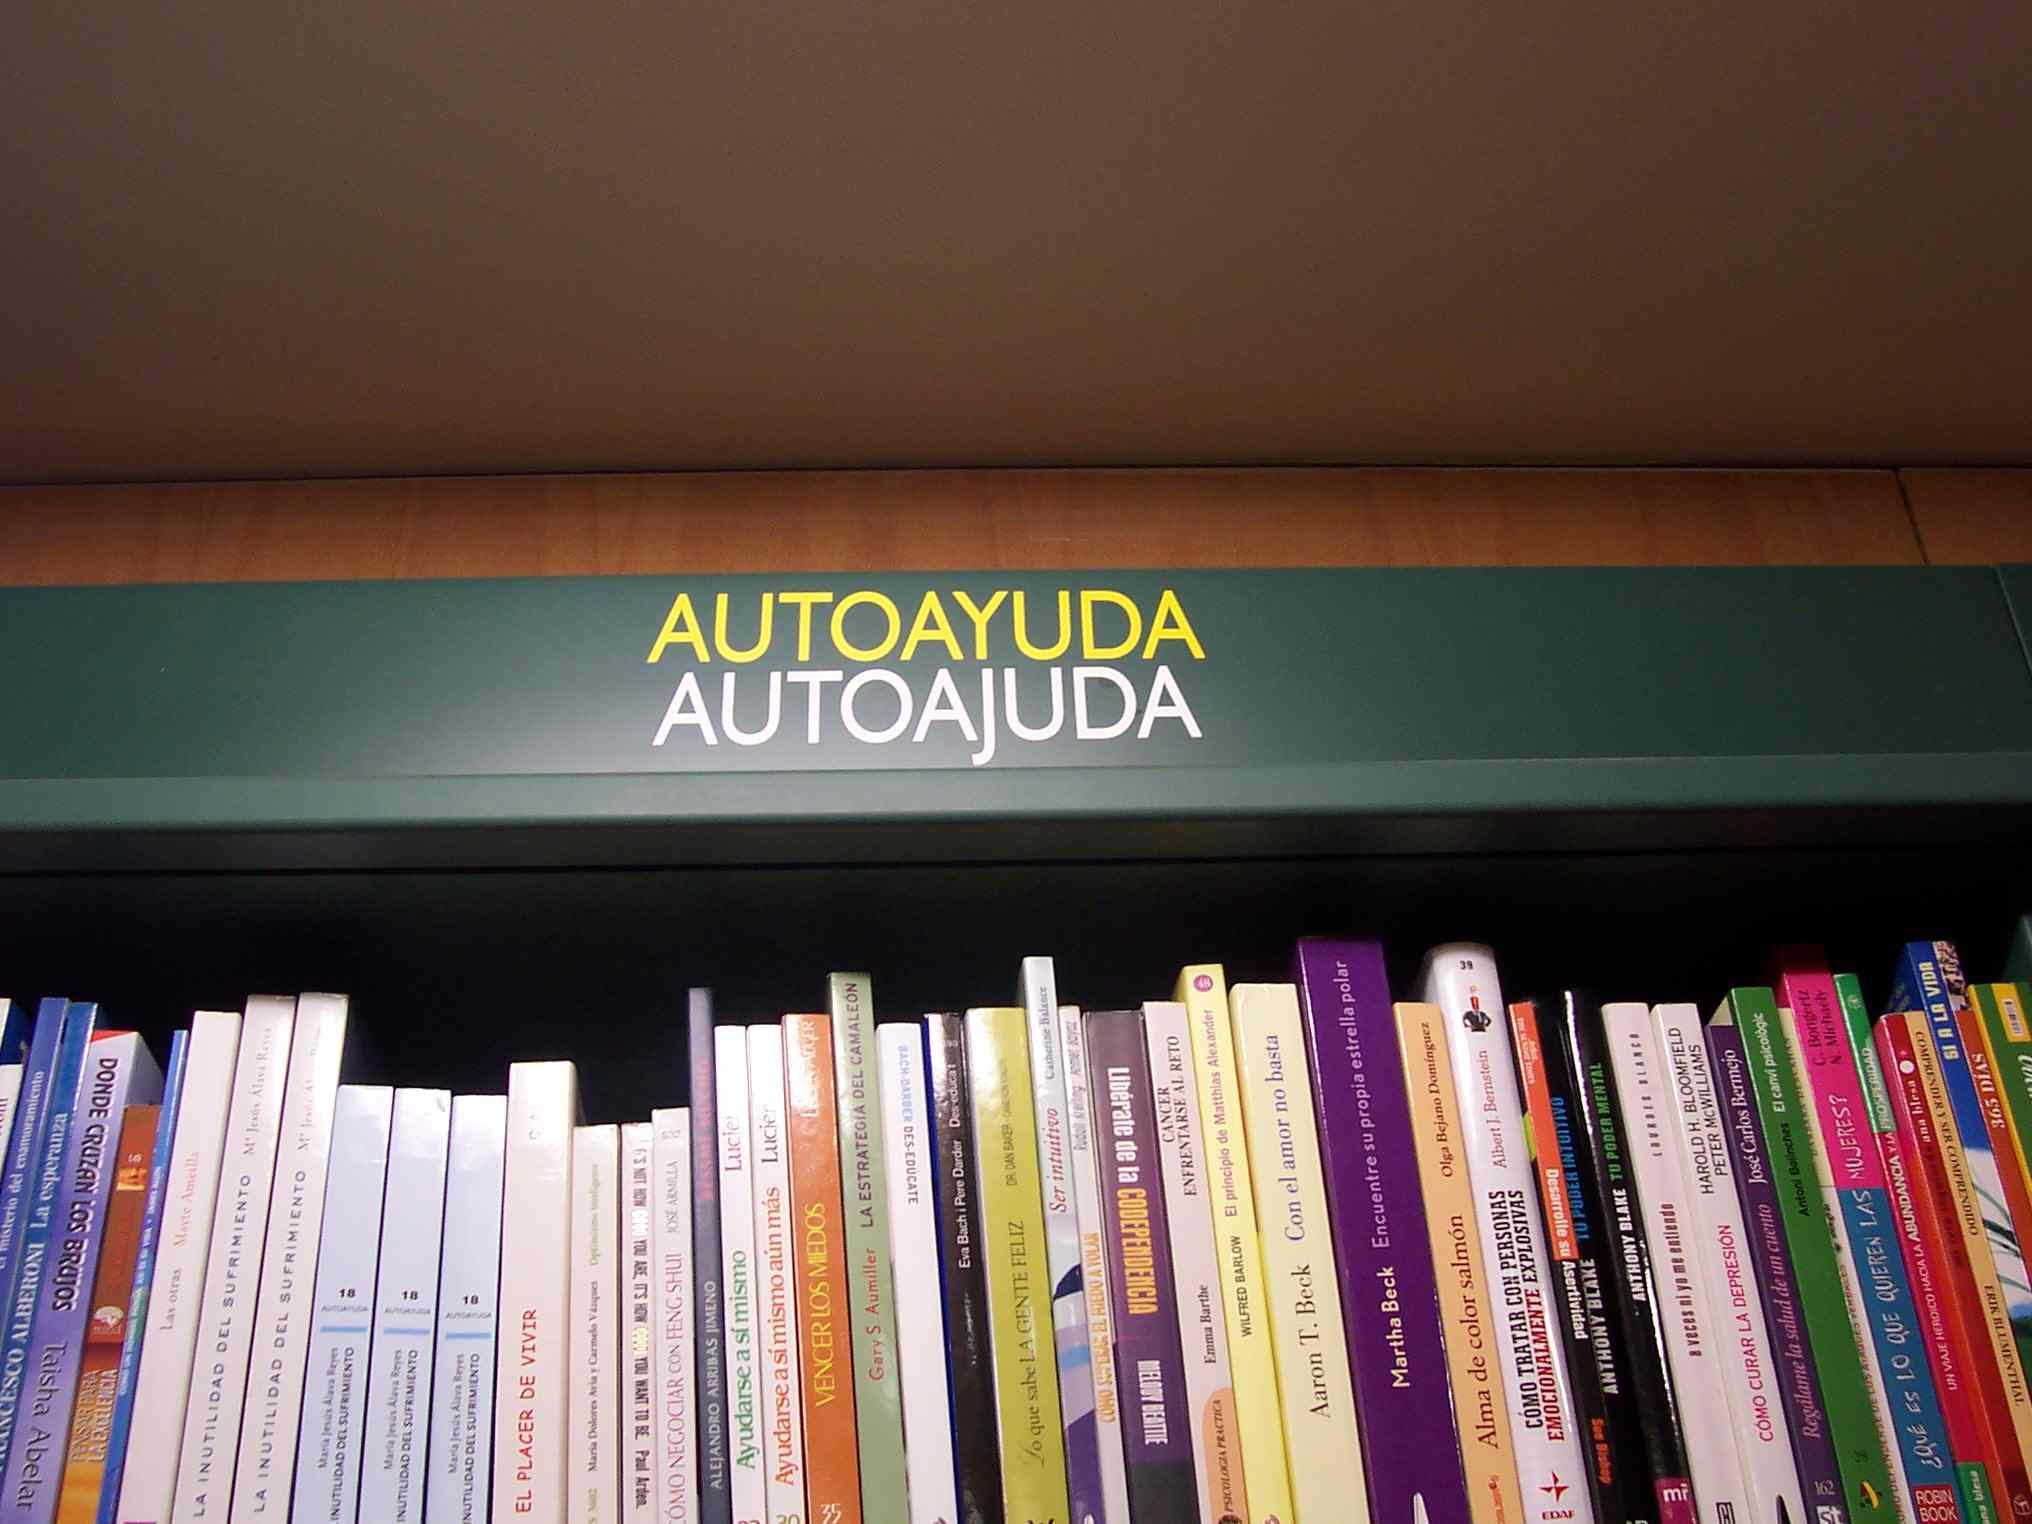 Autoayuda